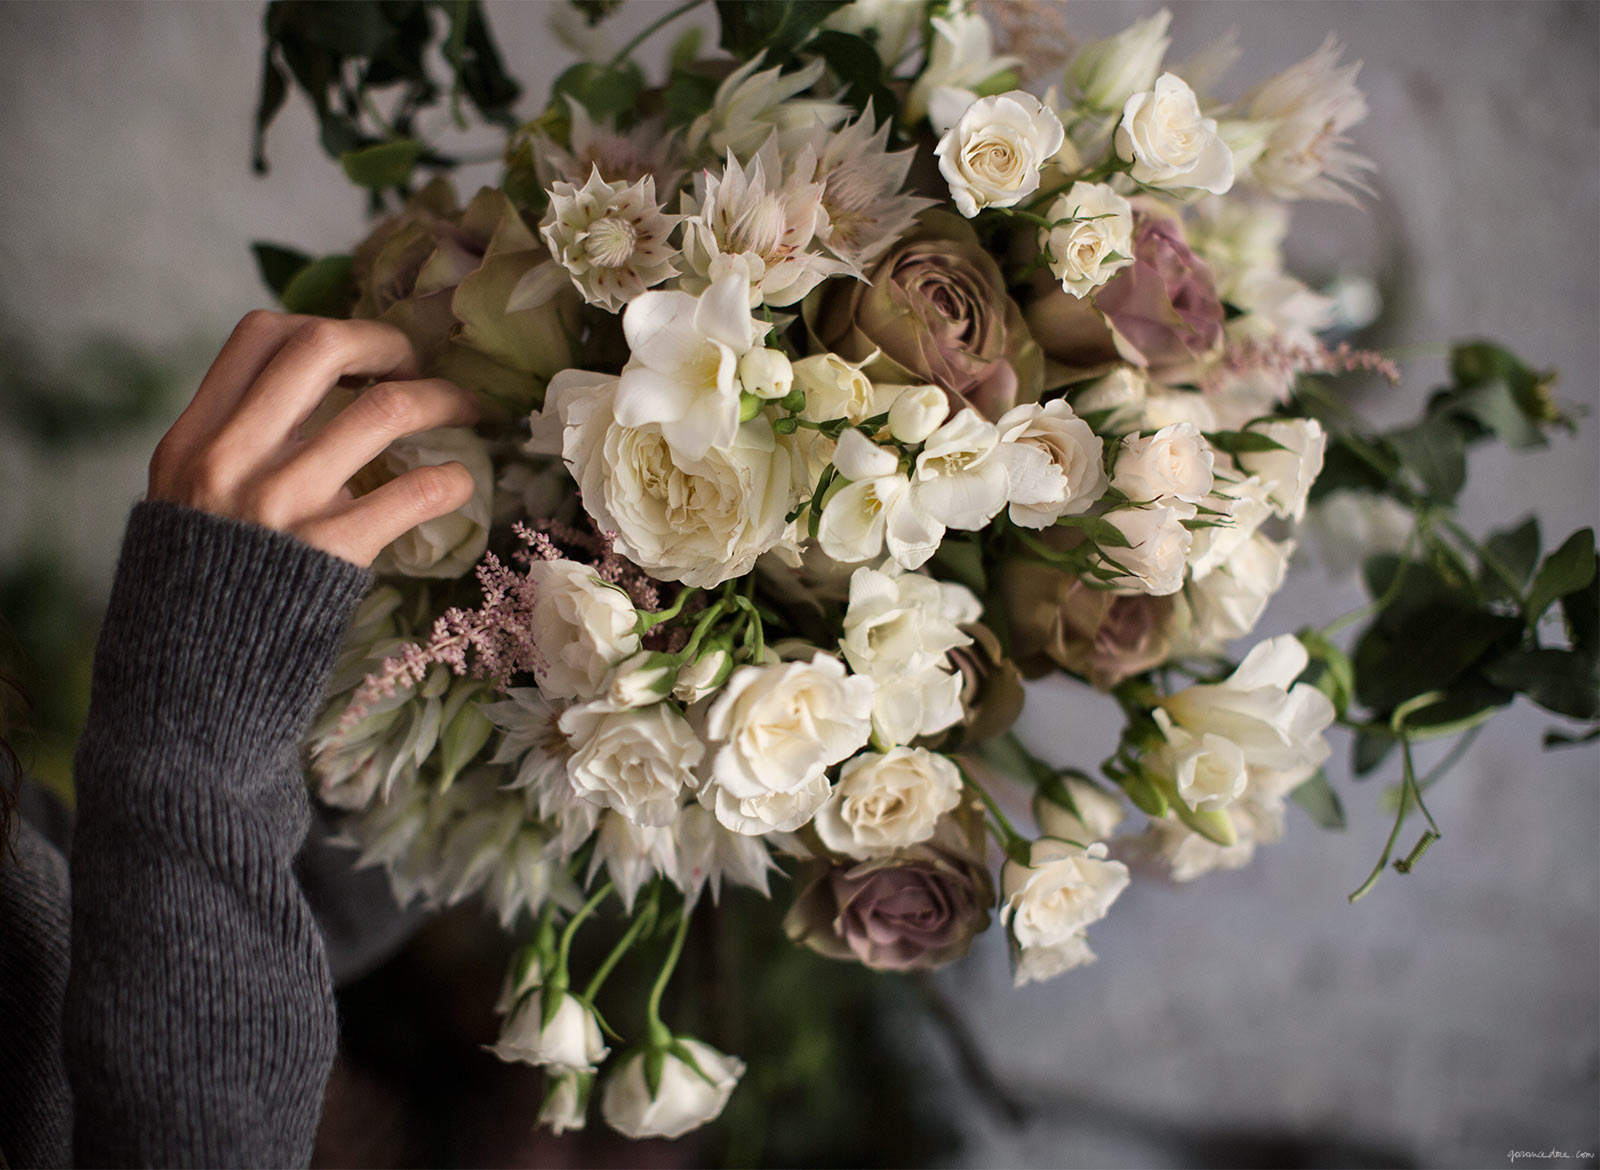 flower-girl-nyc_garance-dore_3.jpg